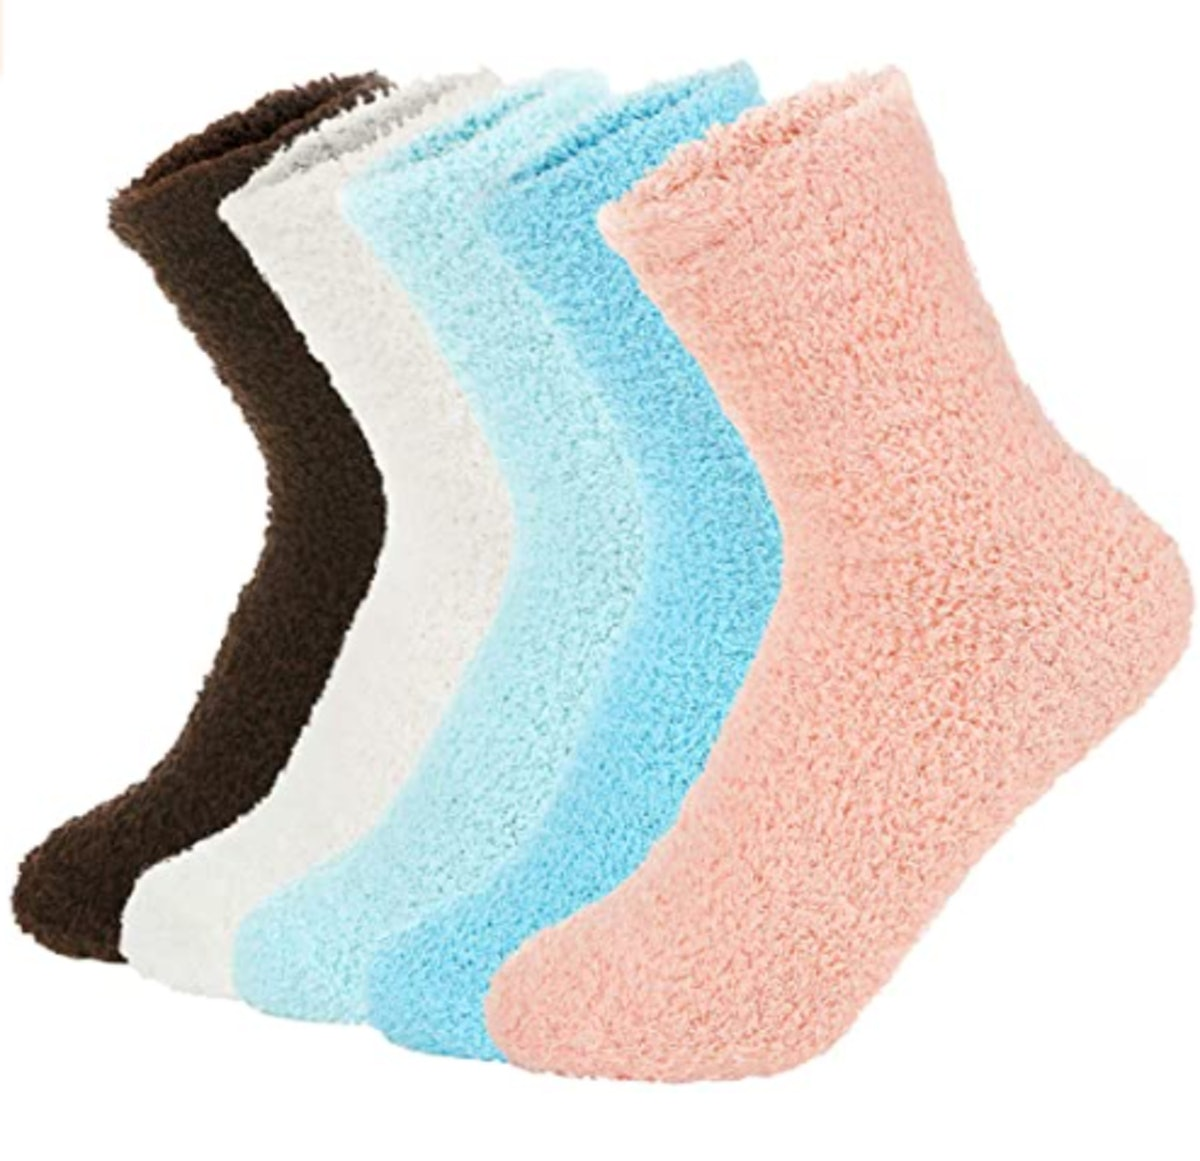 Zando Plush Socks (5-Pack)